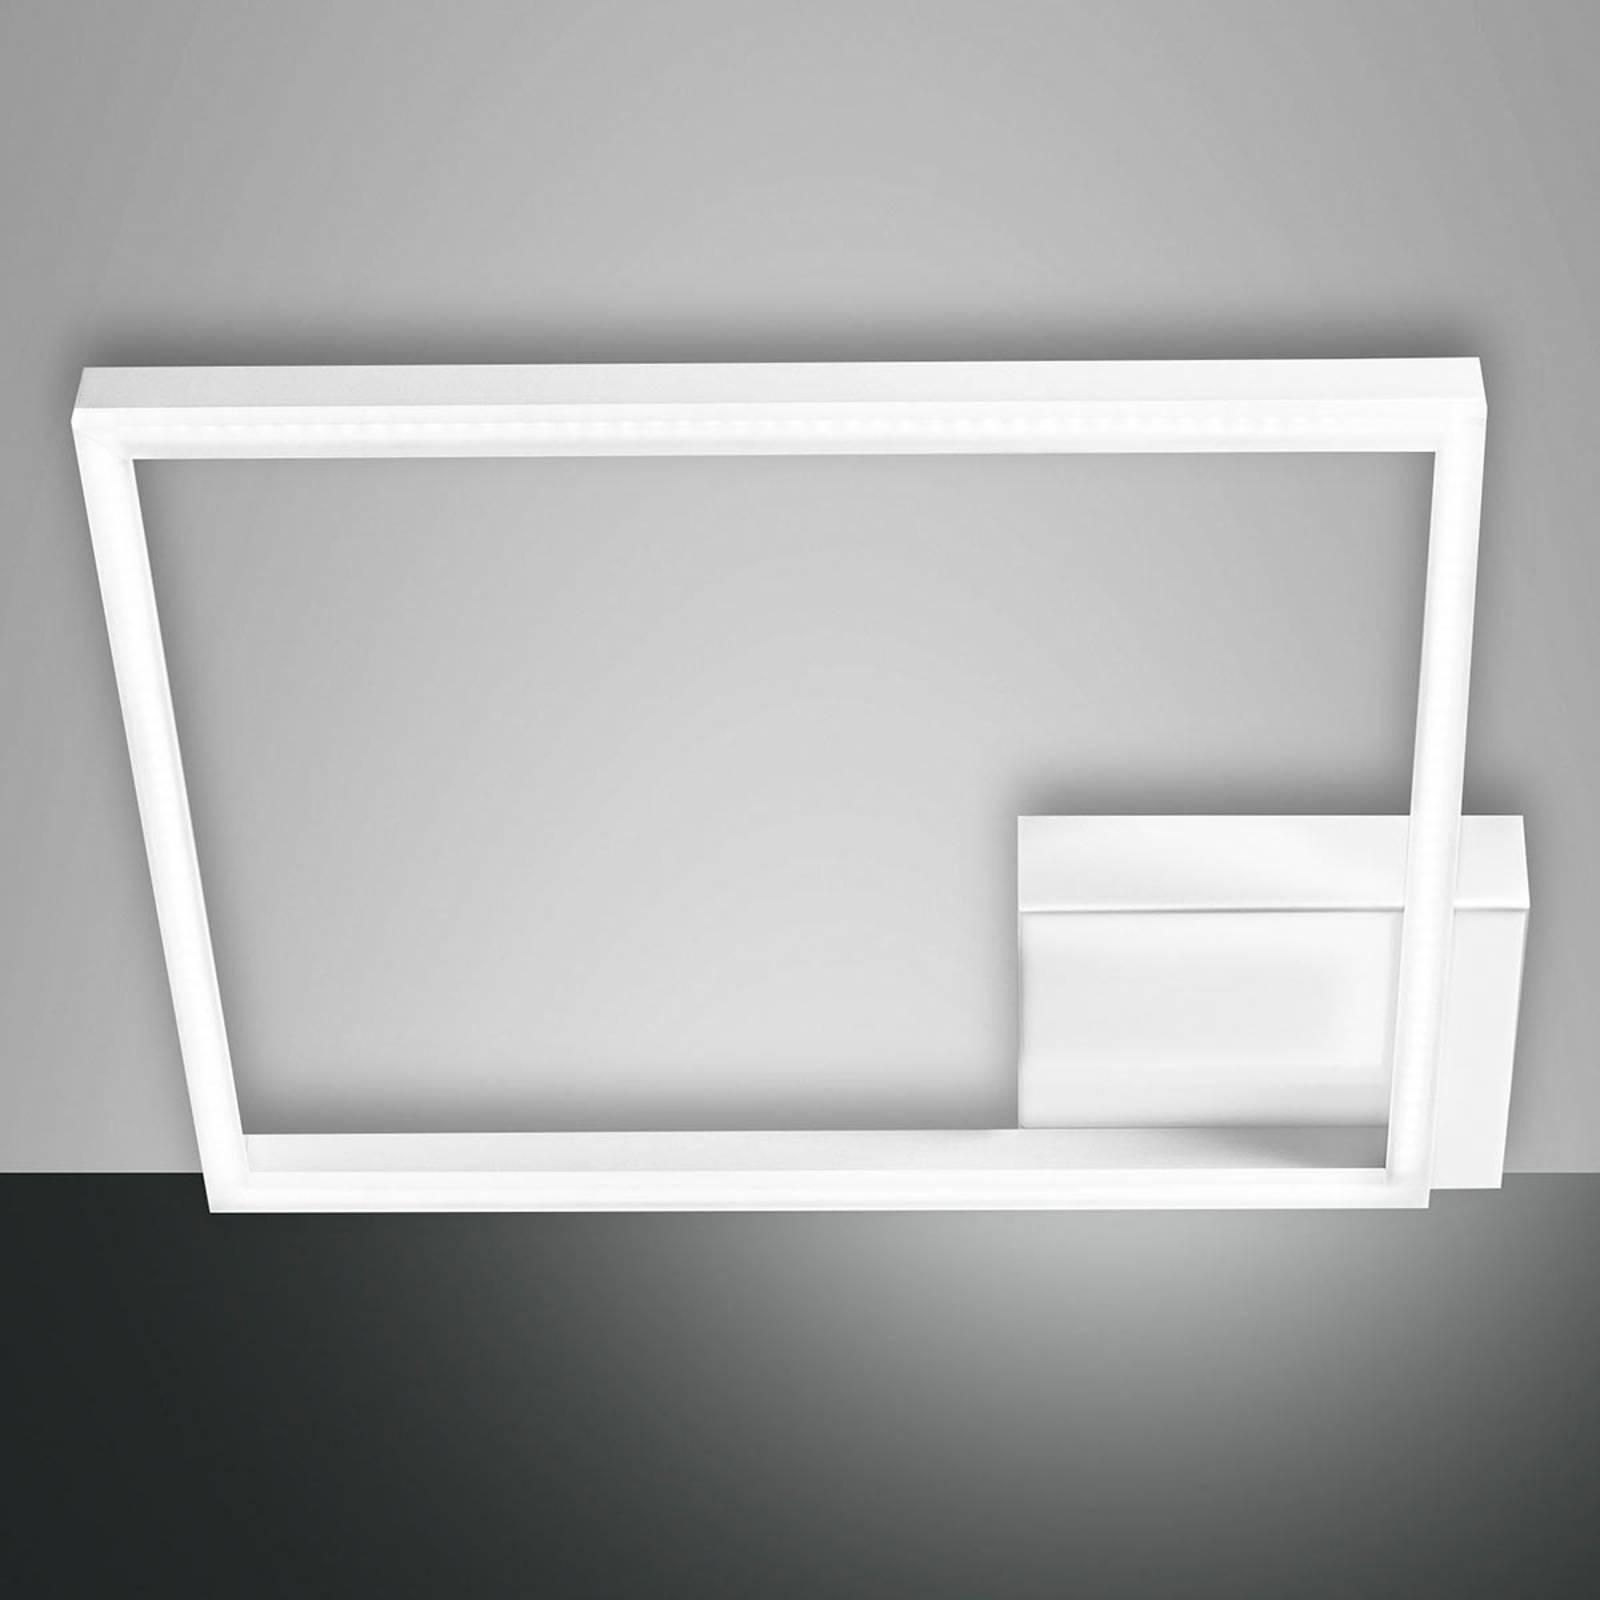 Kwadratowa lampa sufitowa LED Bard, 1-pkt.